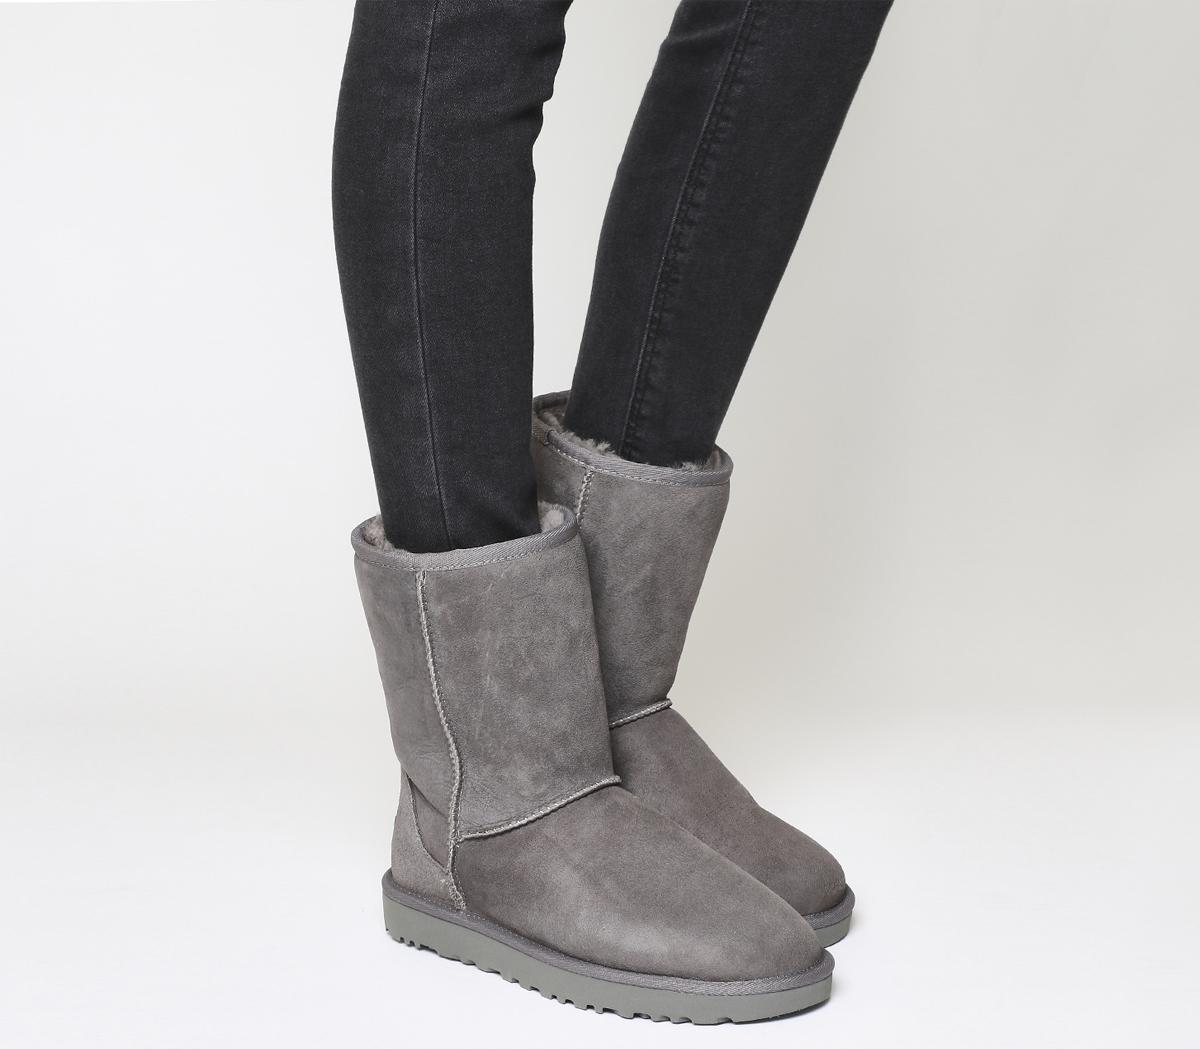 UGG Classic Short II Boots Grey Suede